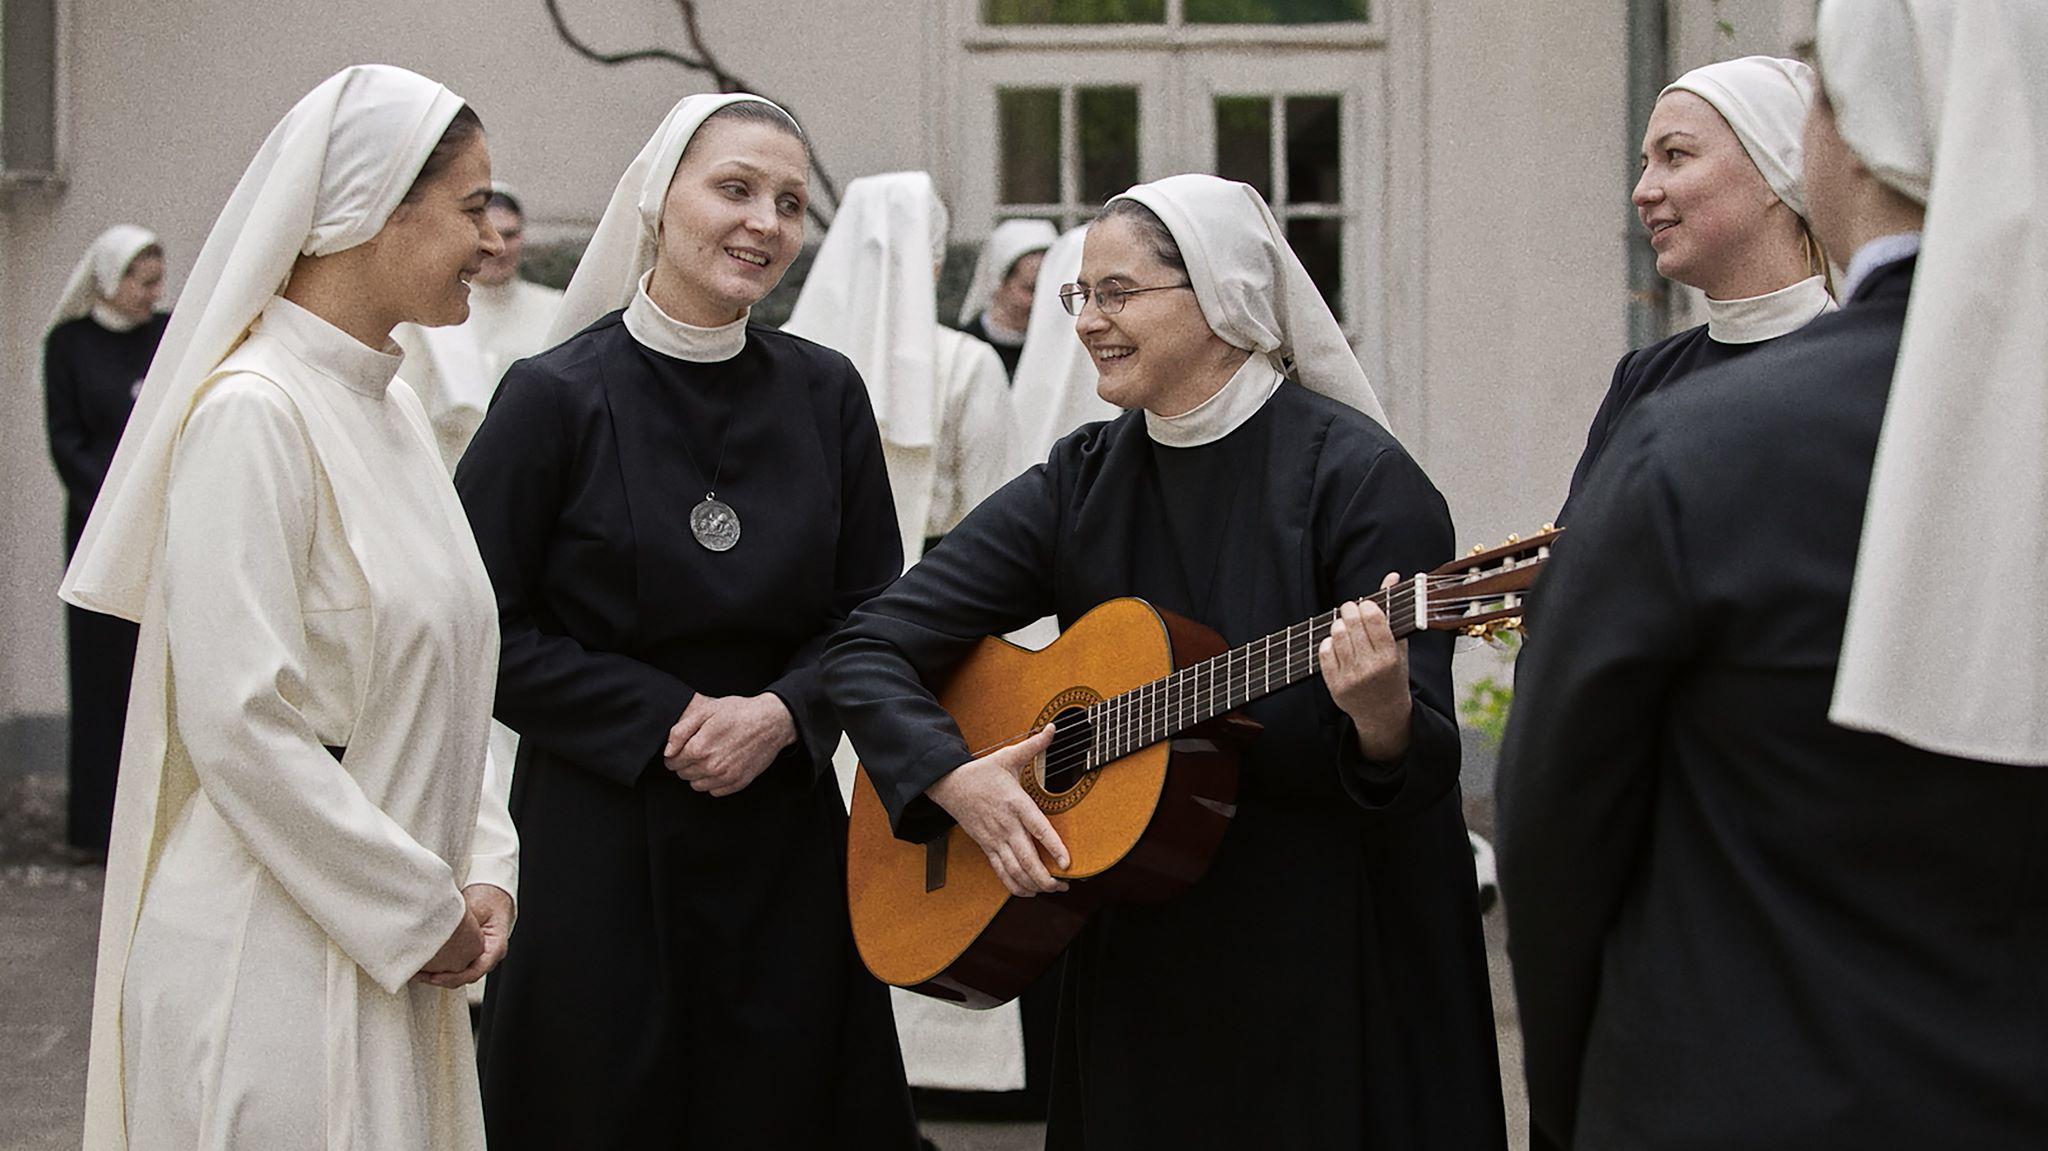 Prošlogodišnji pobjednik publike Zagrebdoxa film 'Nun of Your Business' Ivane Marinić Kragić kreće u domaća kina